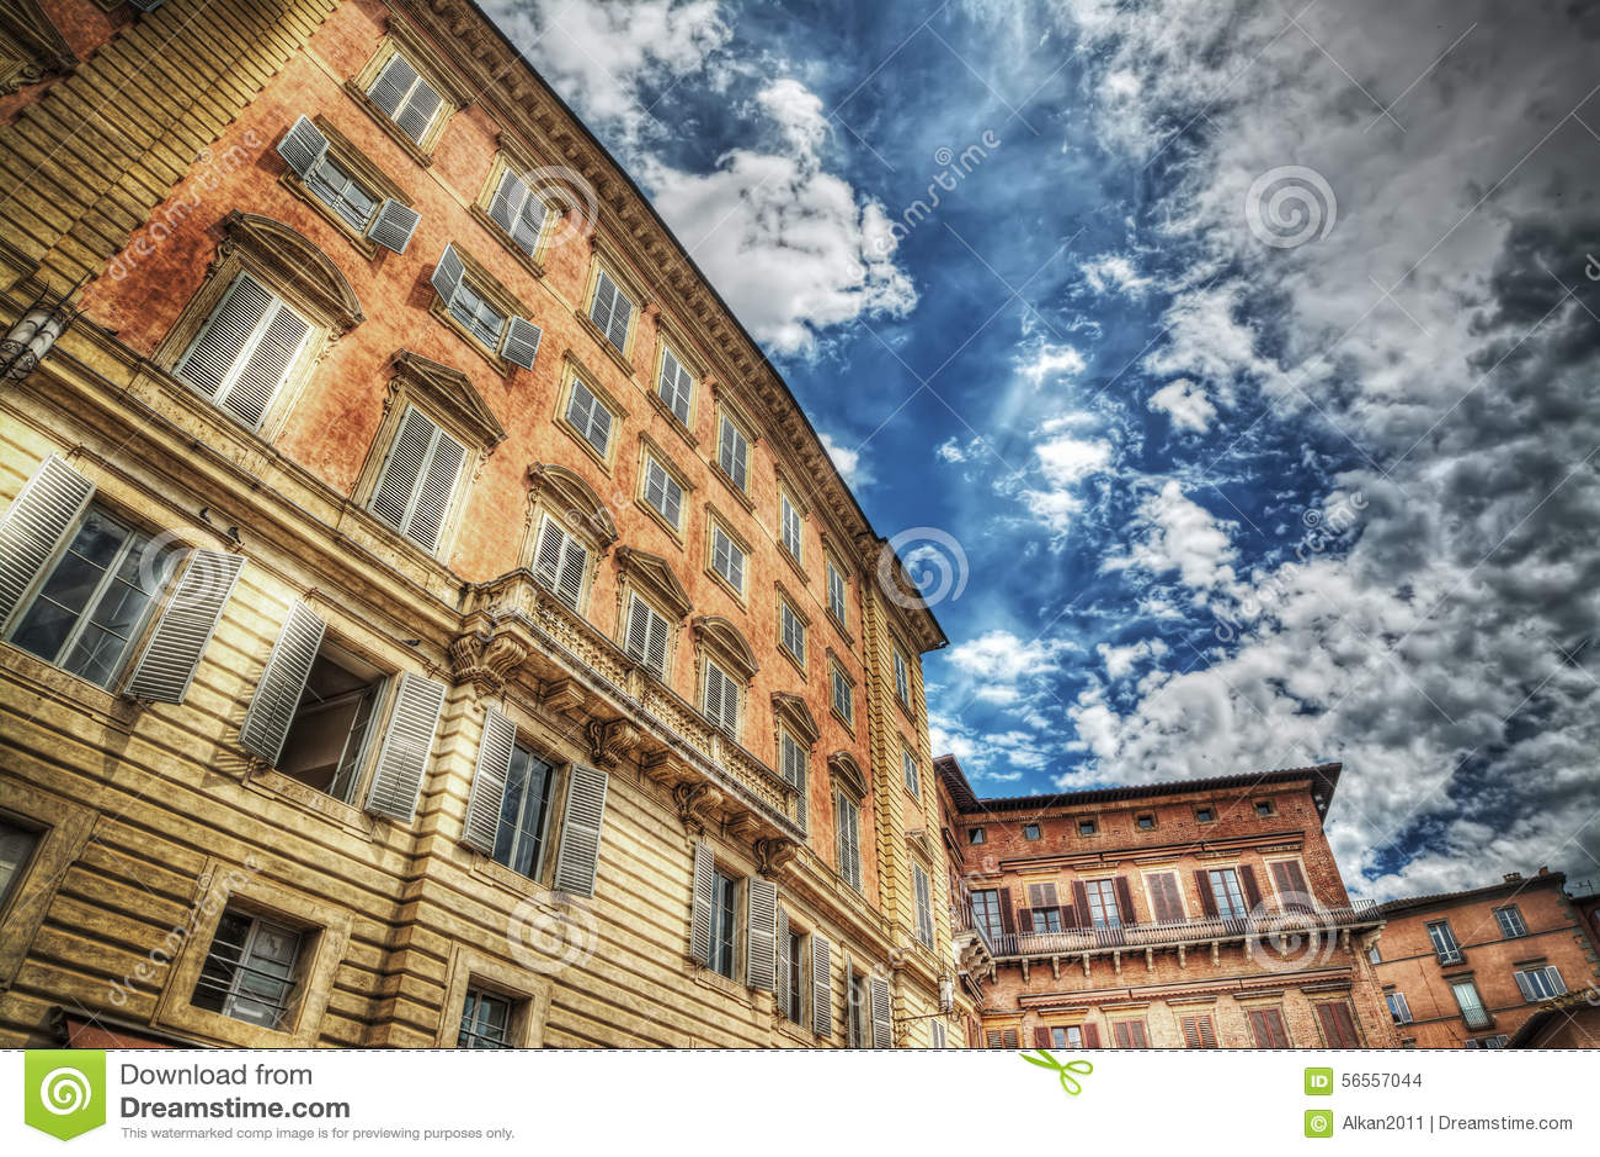 Download Παλάτι Chigi-Zondadari κάτω από έναν νεφελώδη ουρανό Στοκ Εικόνες - εικόνα από πορτοκάλι, ιστορικός: 56557044